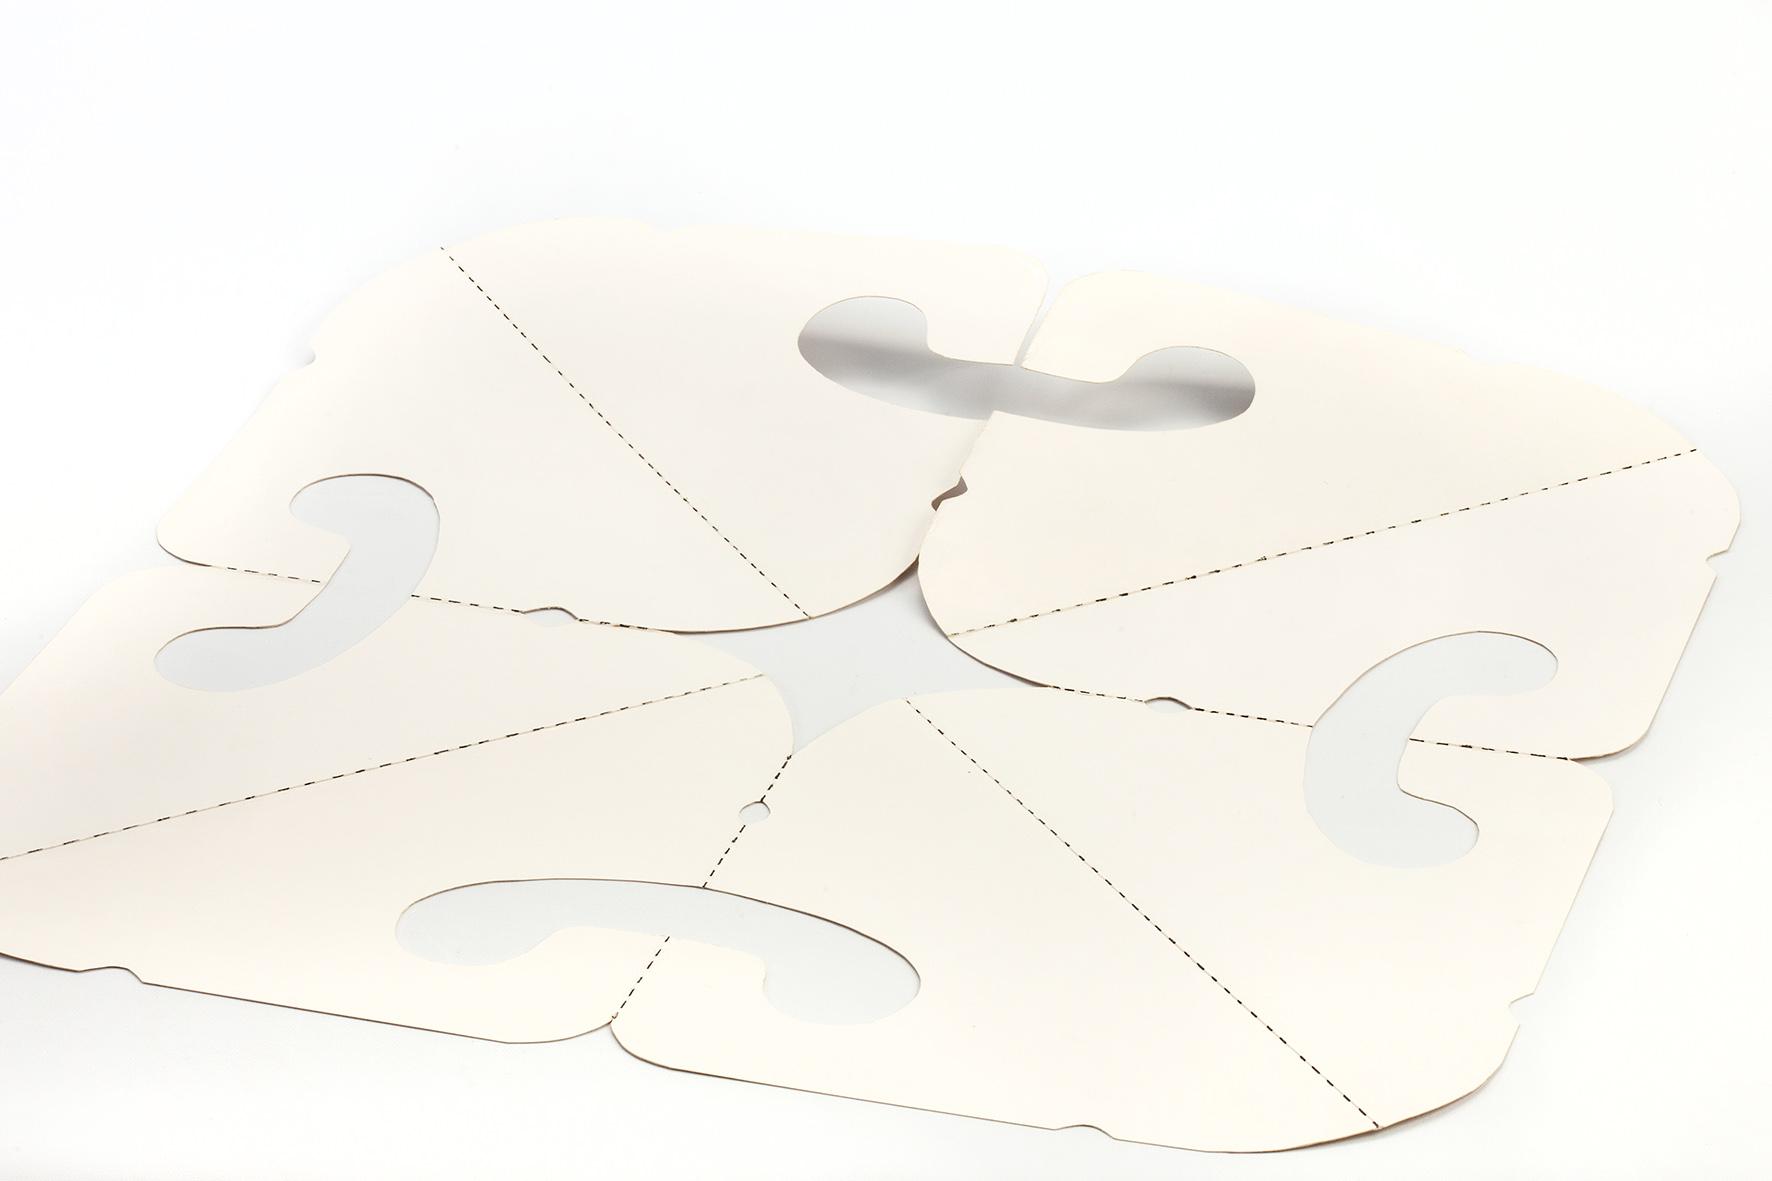 carton-award-image 129766